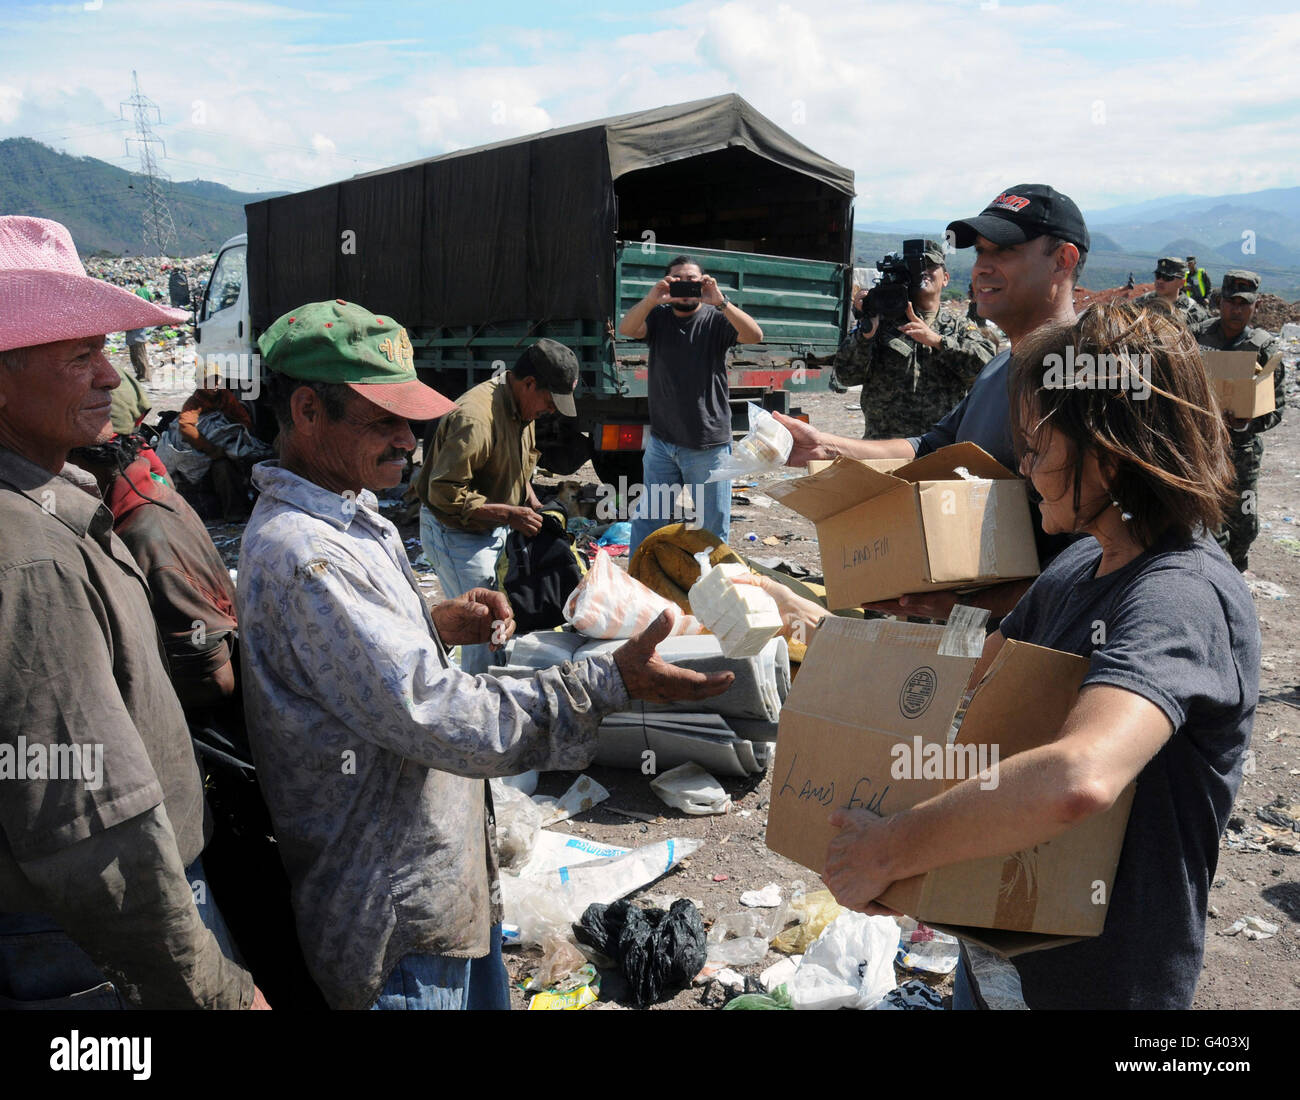 Humanitarian relief efforts in Tegucigalpa, Honduras. - Stock Image